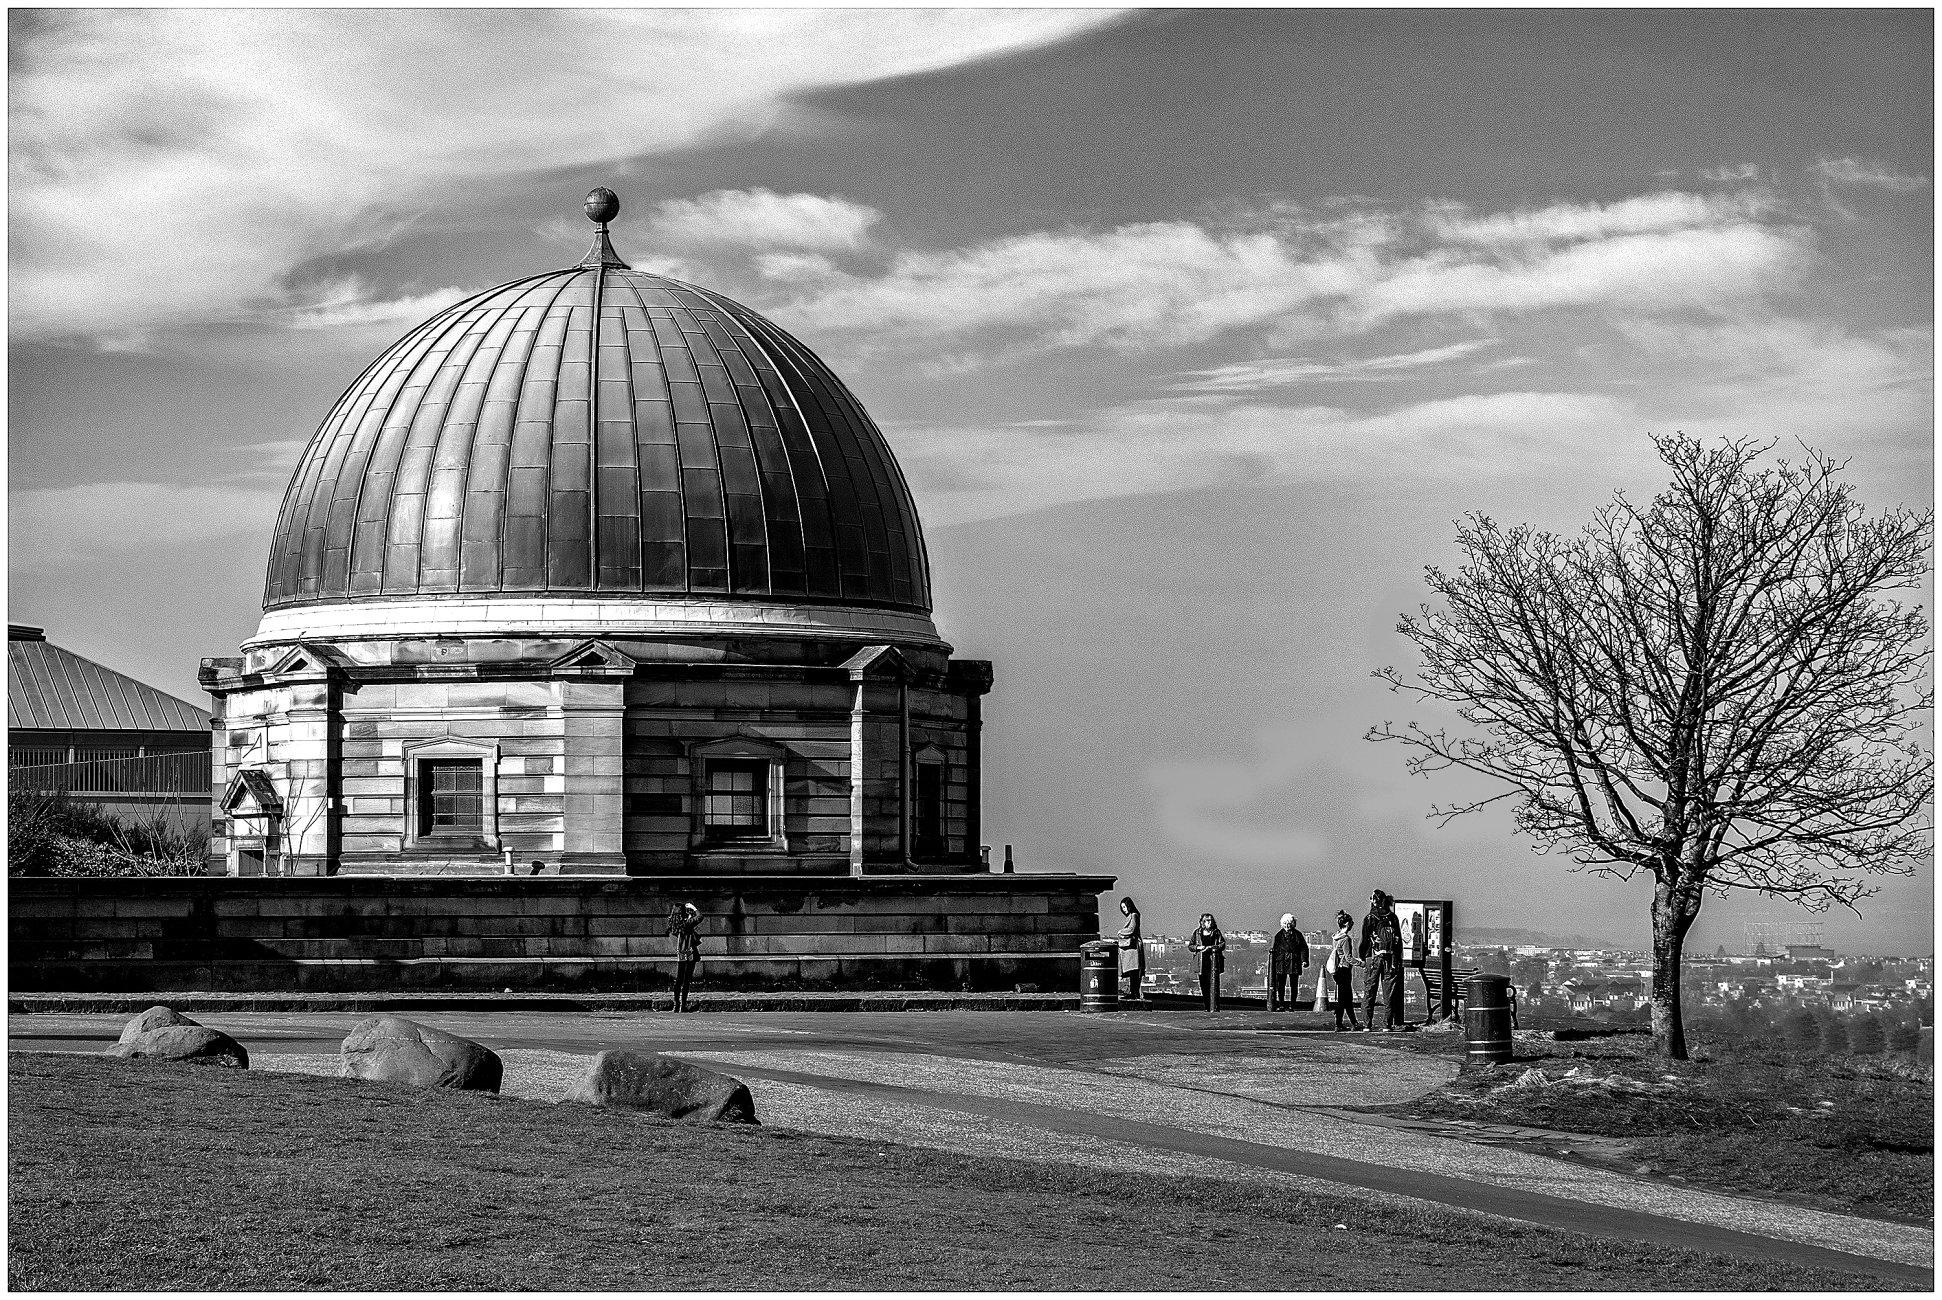 Observatory, Calton Hill